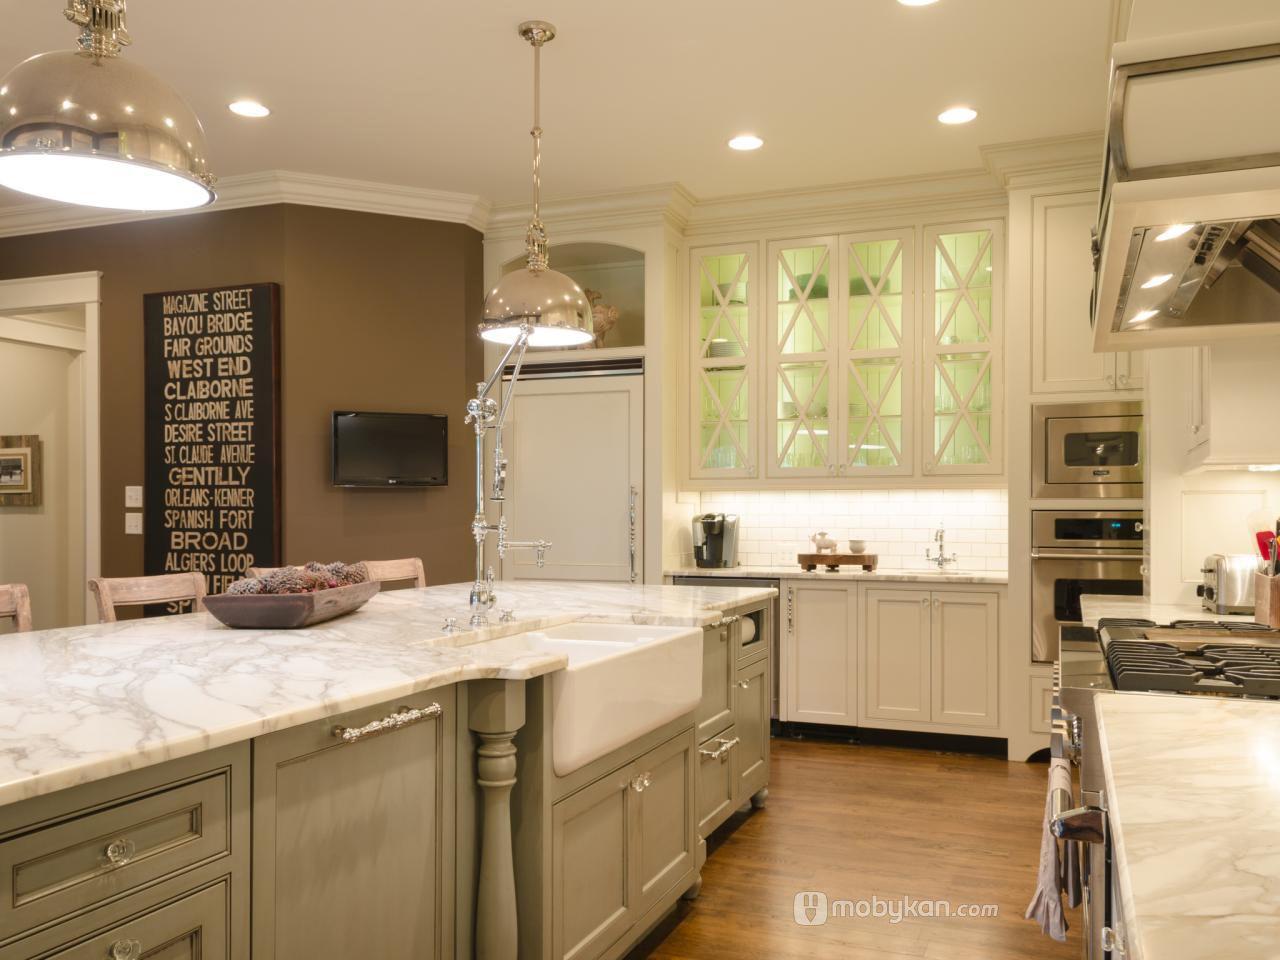 اشكال مطابخ صغيره و صور مطابخ مميزه و تصميميات مودرن و مختلفه موبيكان Cheap Kitchen Remodel Diy Kitchen Remodel Simple Kitchen Remodel